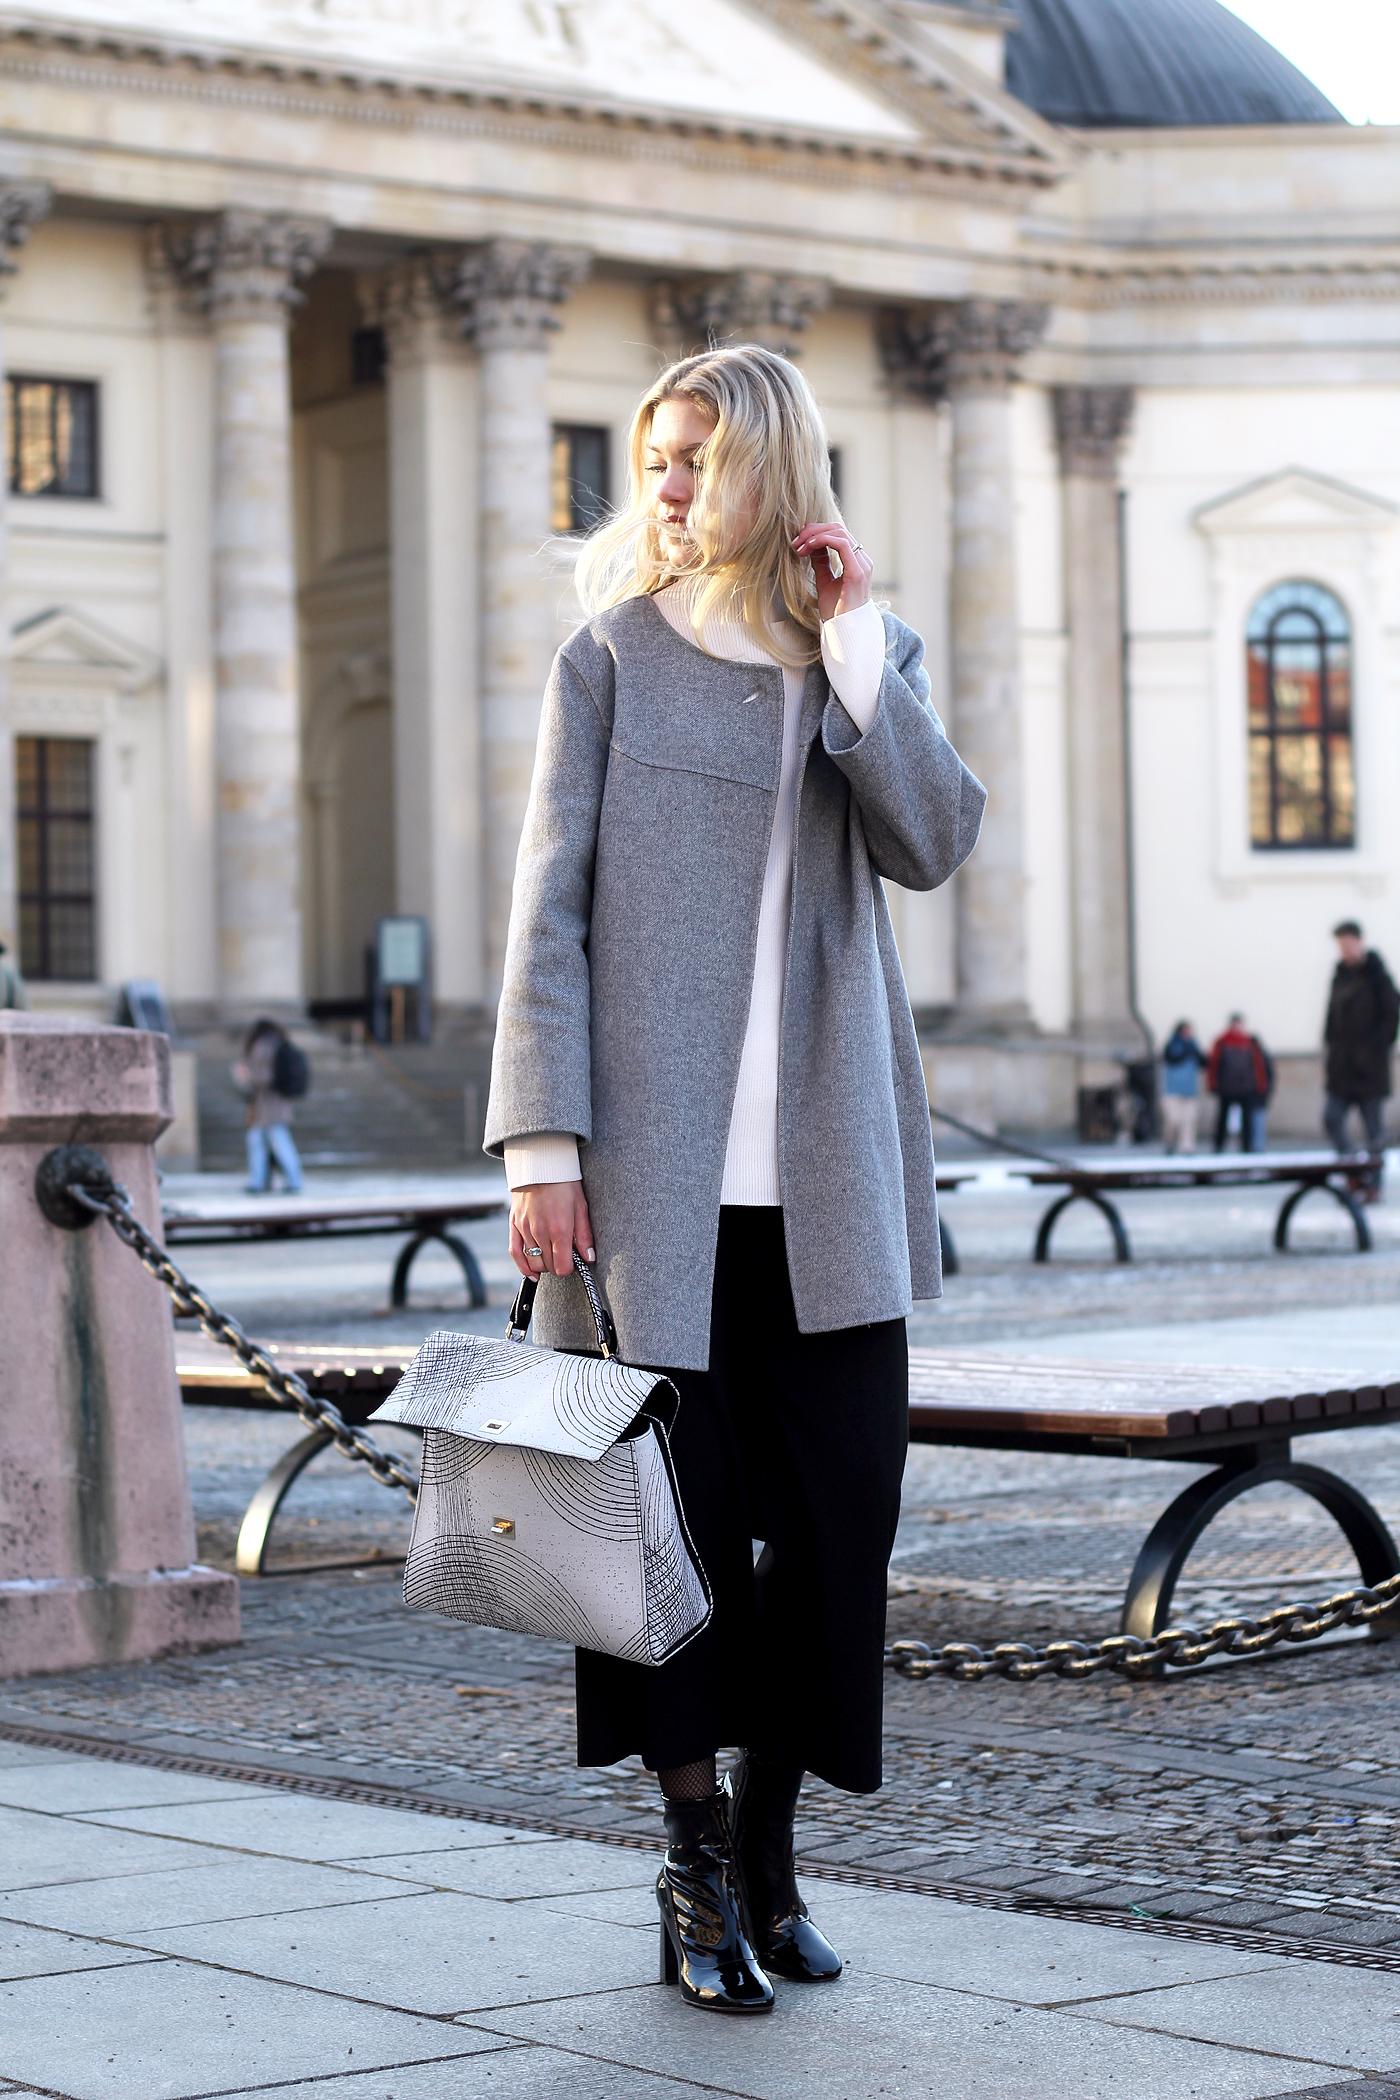 somehappyshoes_fashionblog_Berlin_fashion_week_look_Zara_hugo_boss7